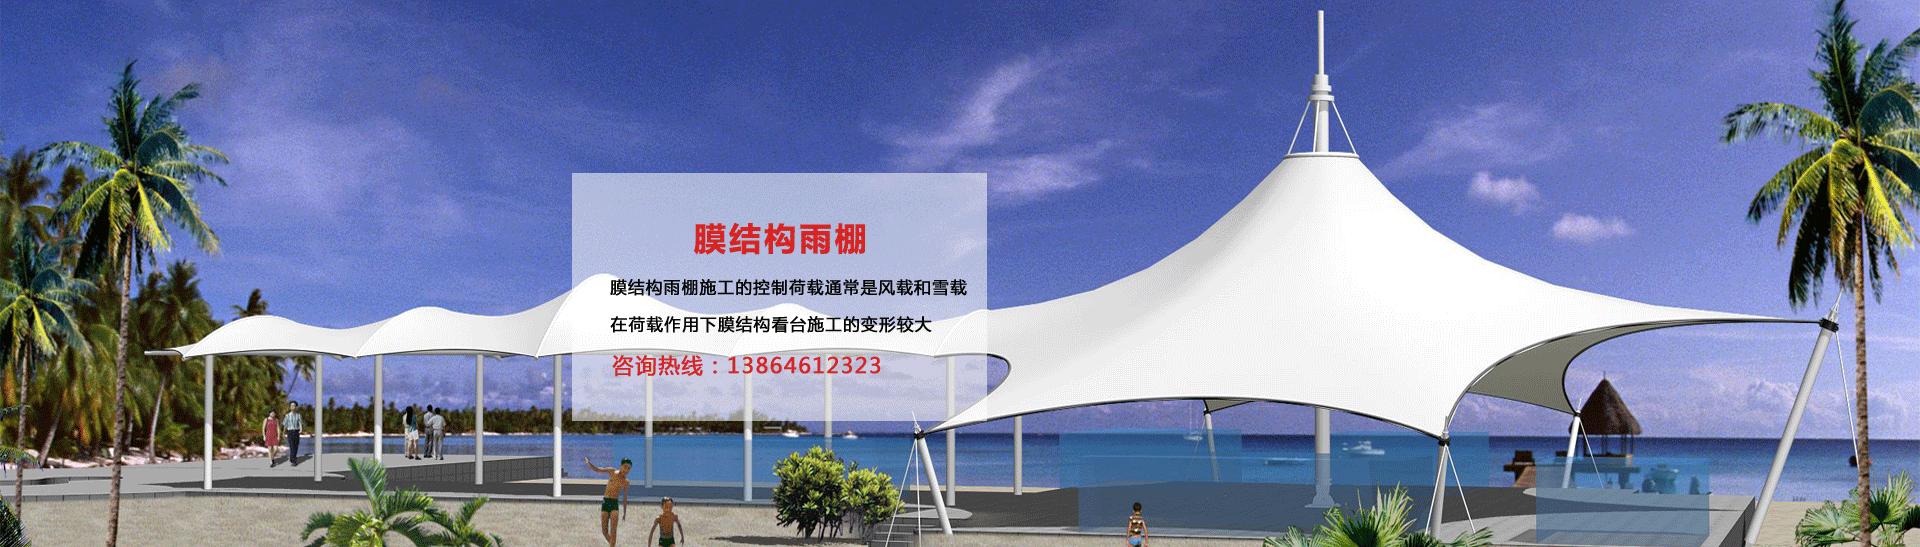 chong气mo结构胔ao?   /></a></li></ul></div></div>       <map dropzone=